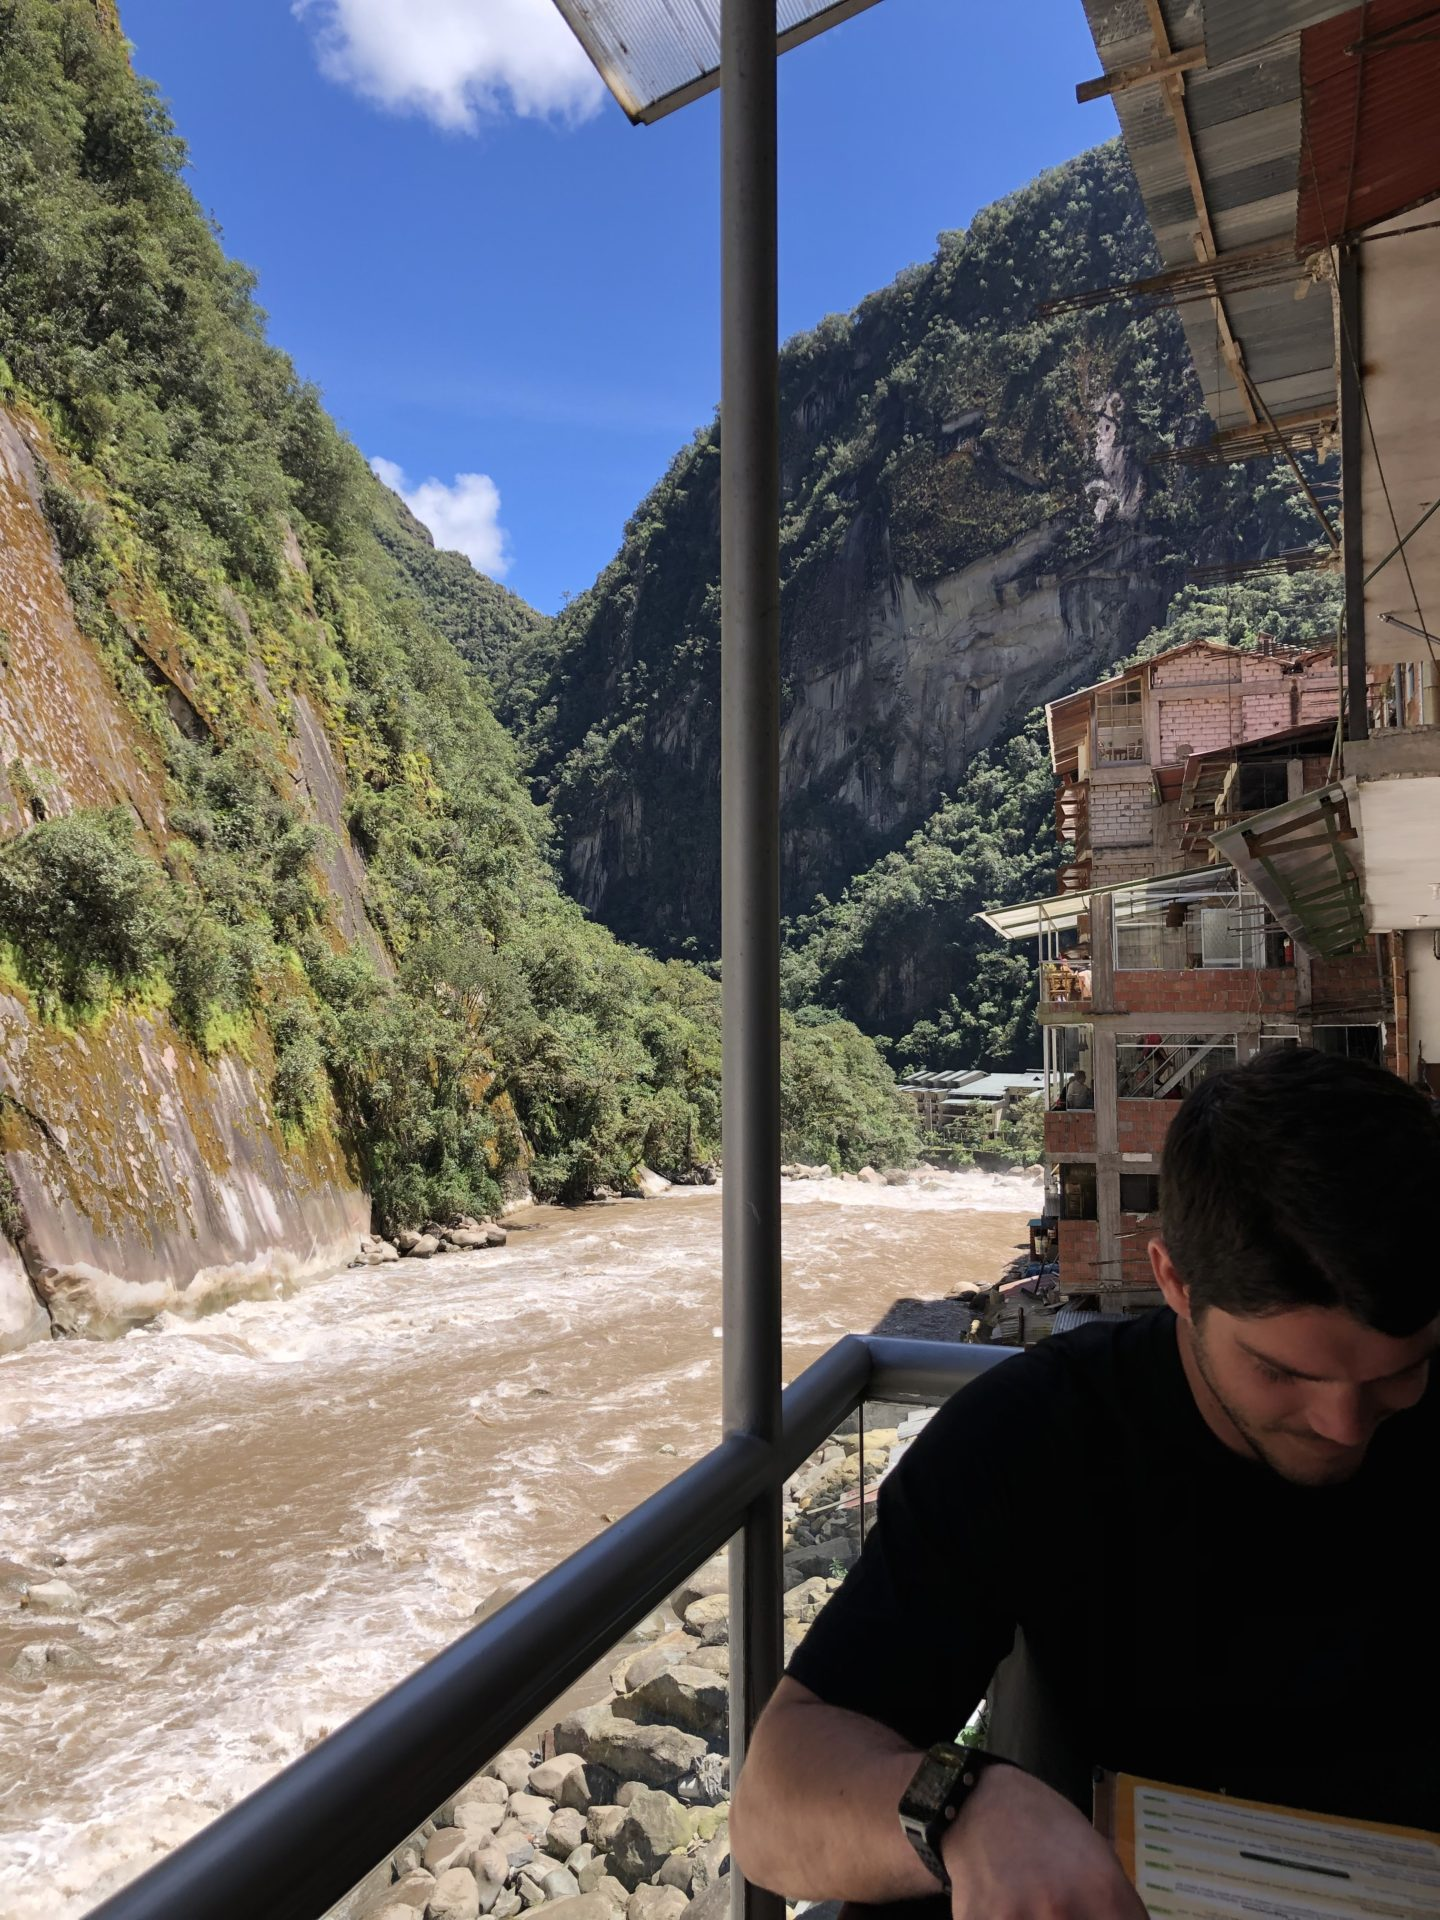 Peru, you are so beautiful! Enjoying a Peruvian lunch along the riverside at the base of Machu Picchu after 4 days of hiking.